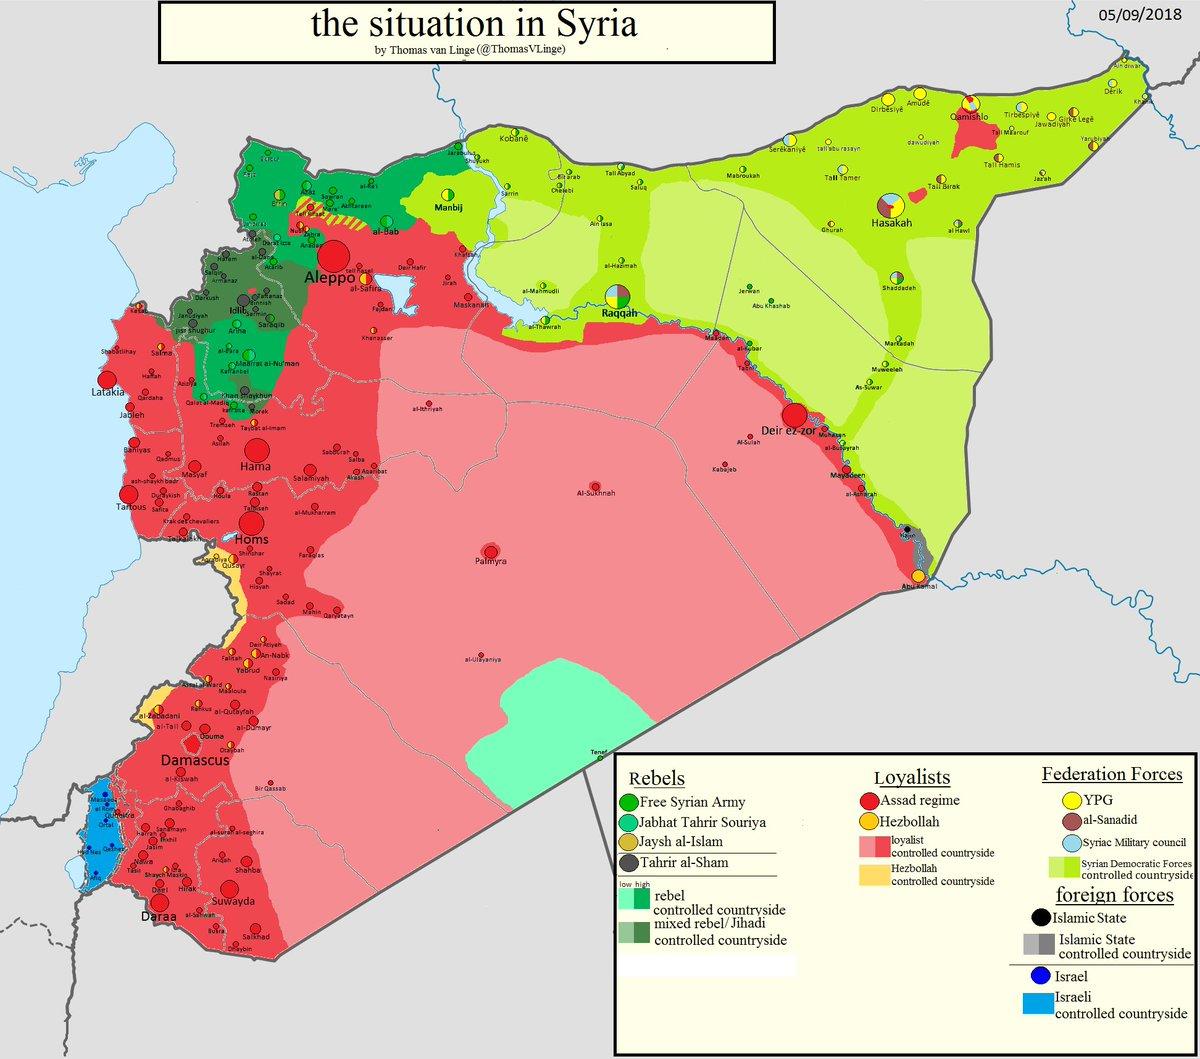 Thomas Van Linge.Thomas Van Linge On Twitter Syria Map Update The